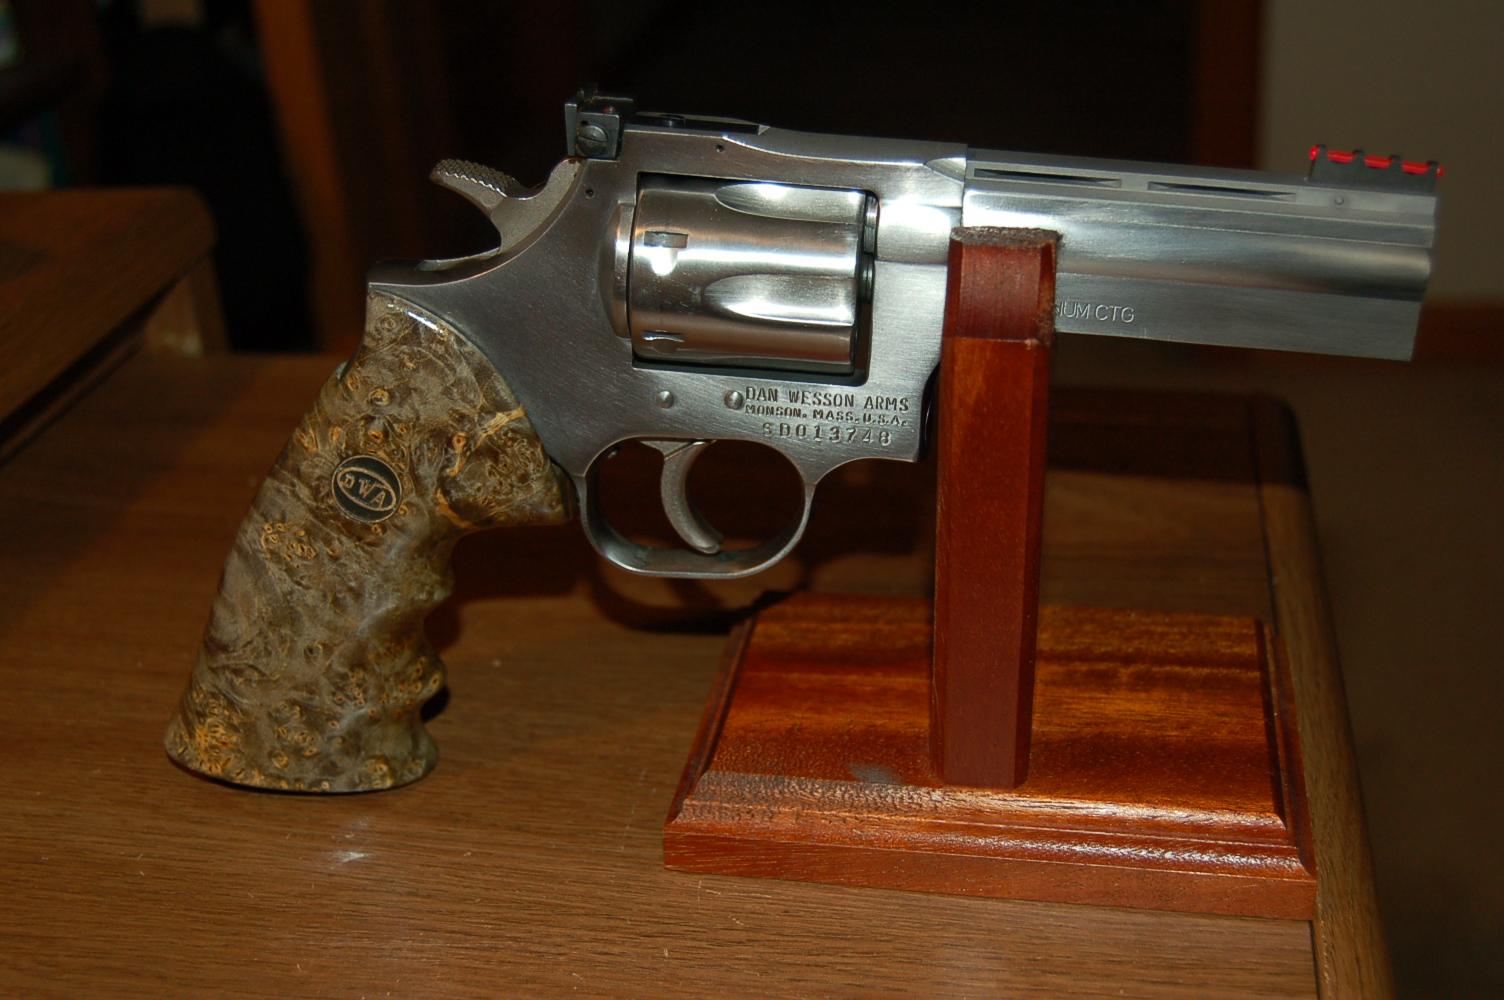 New Lb Grip Dan Wesson Small Frame Revolvers Dan Wesson Forum